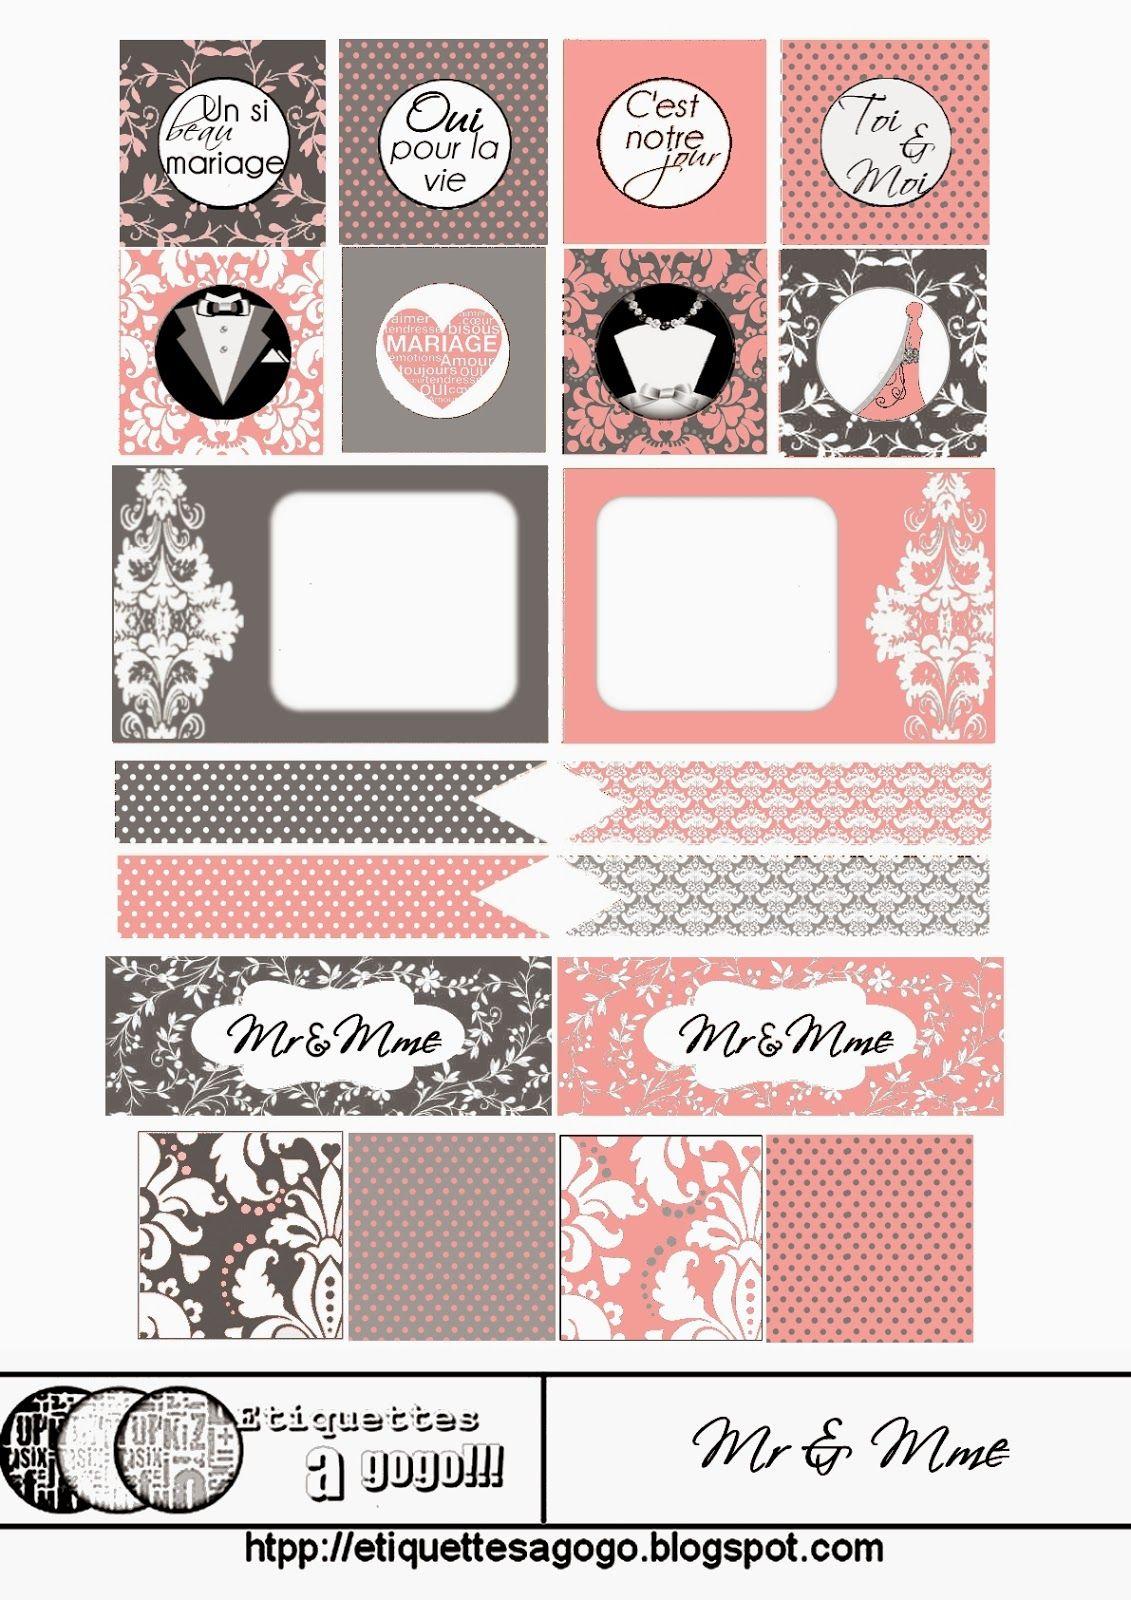 Bodas: Etiquetas de Diferentes Colores para Imprimir Gratis. | boda ...